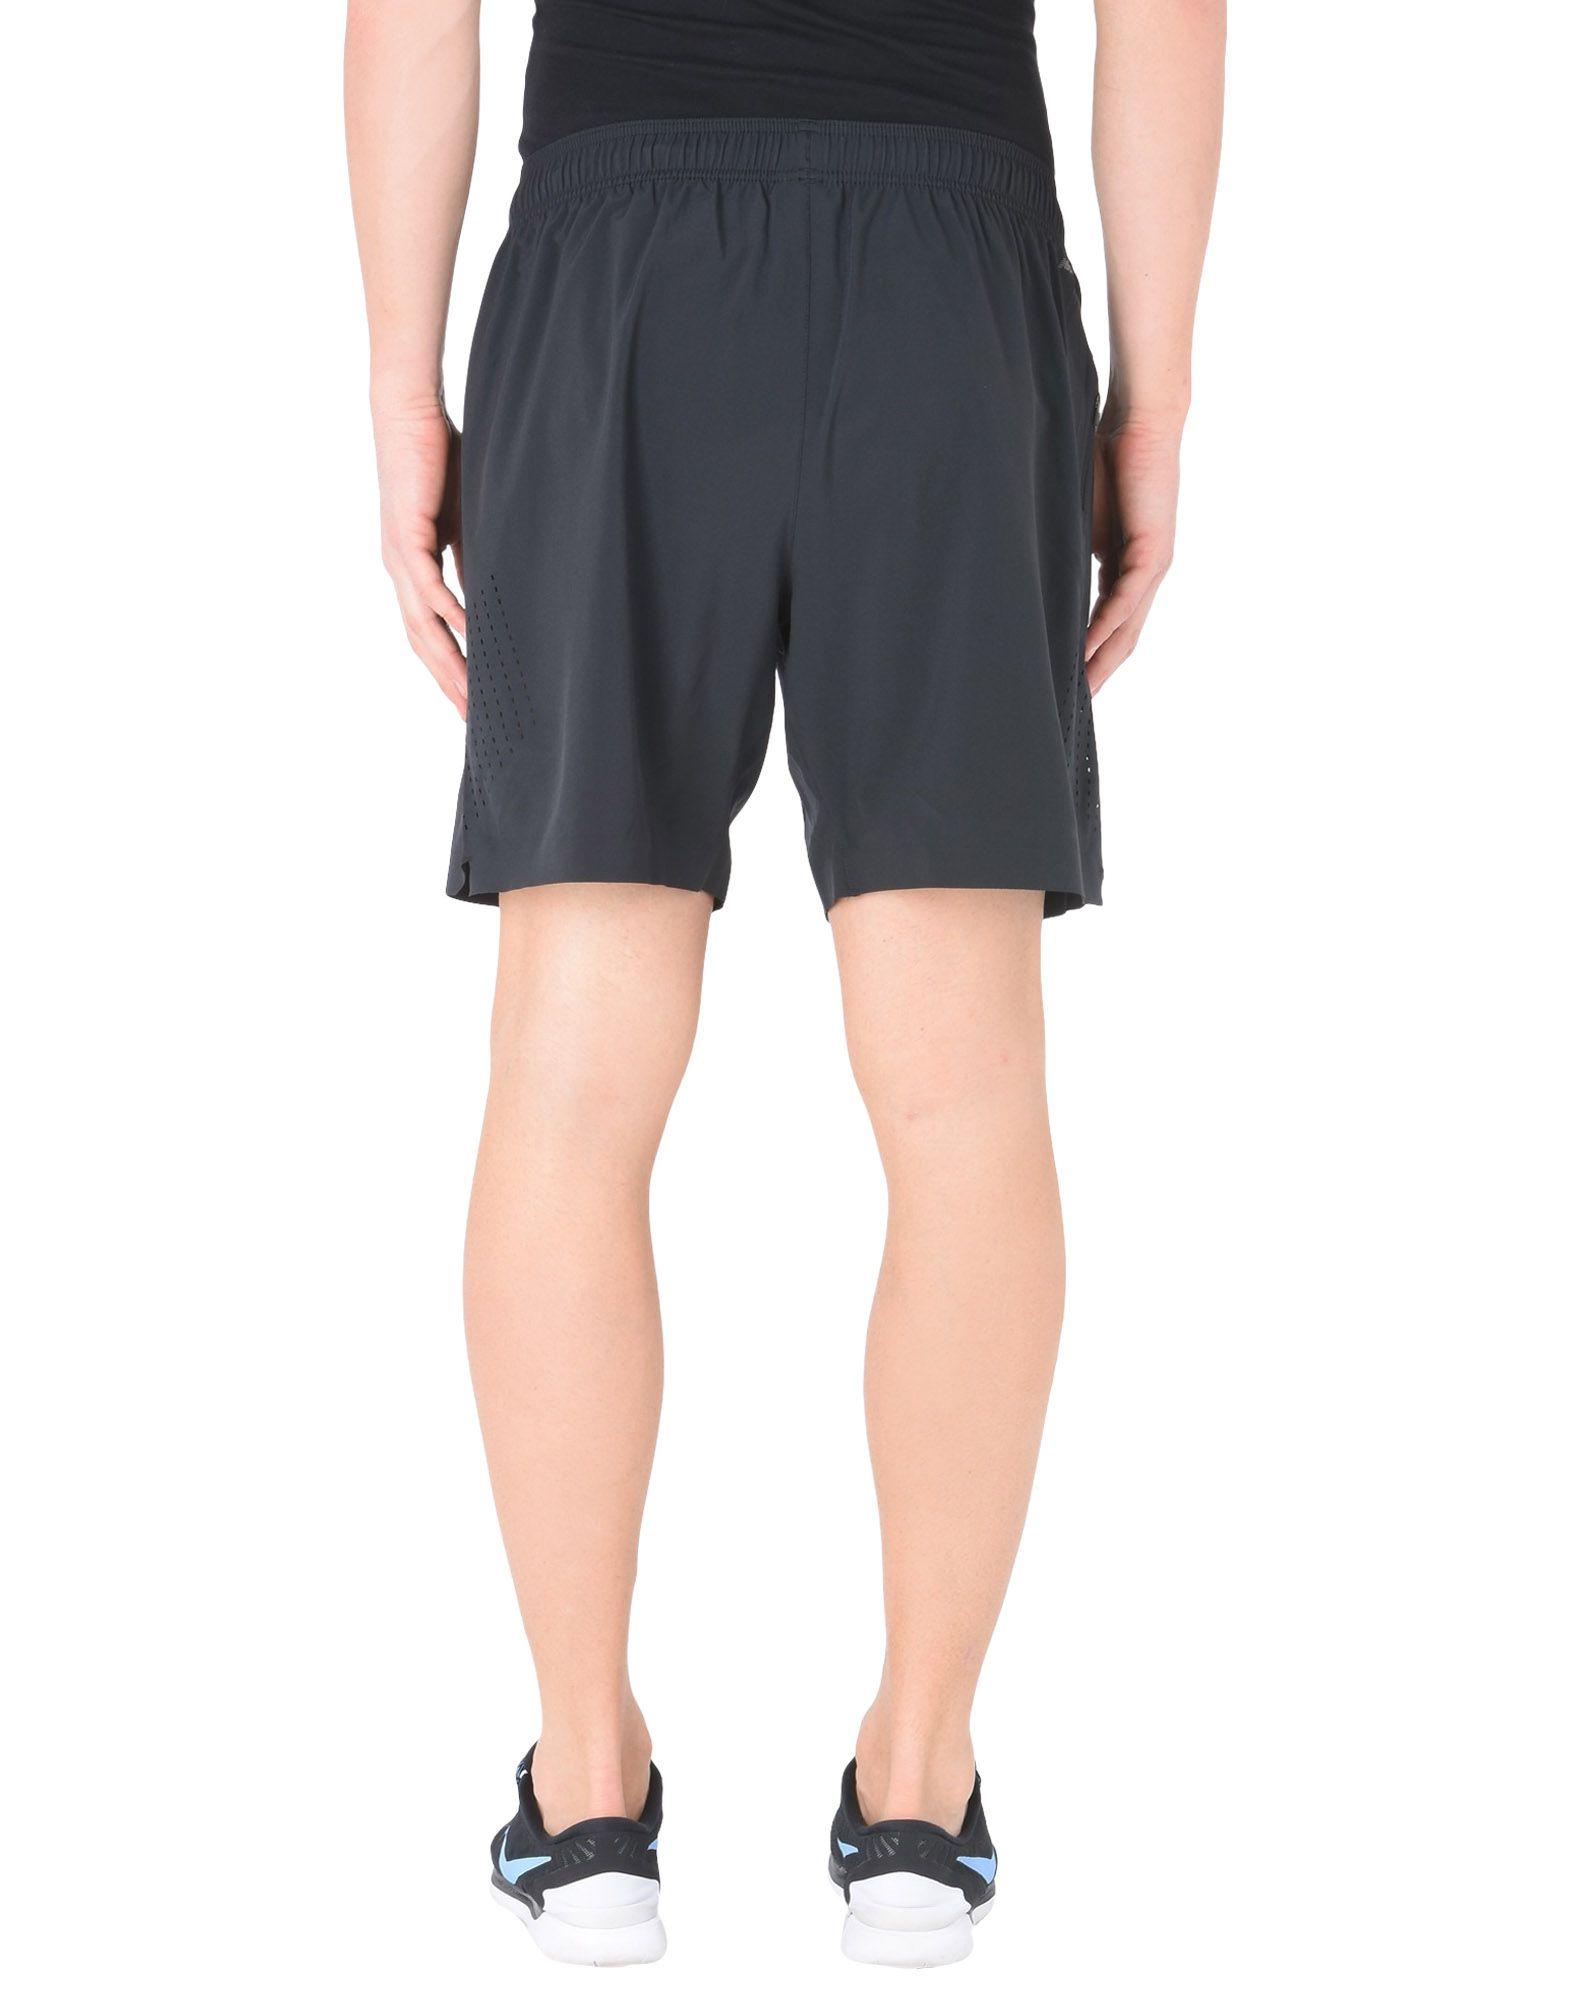 Pantalone Sportivo Nuovo Balance 7In Shift Short - - - Uomo - 36993316QJ a35b70